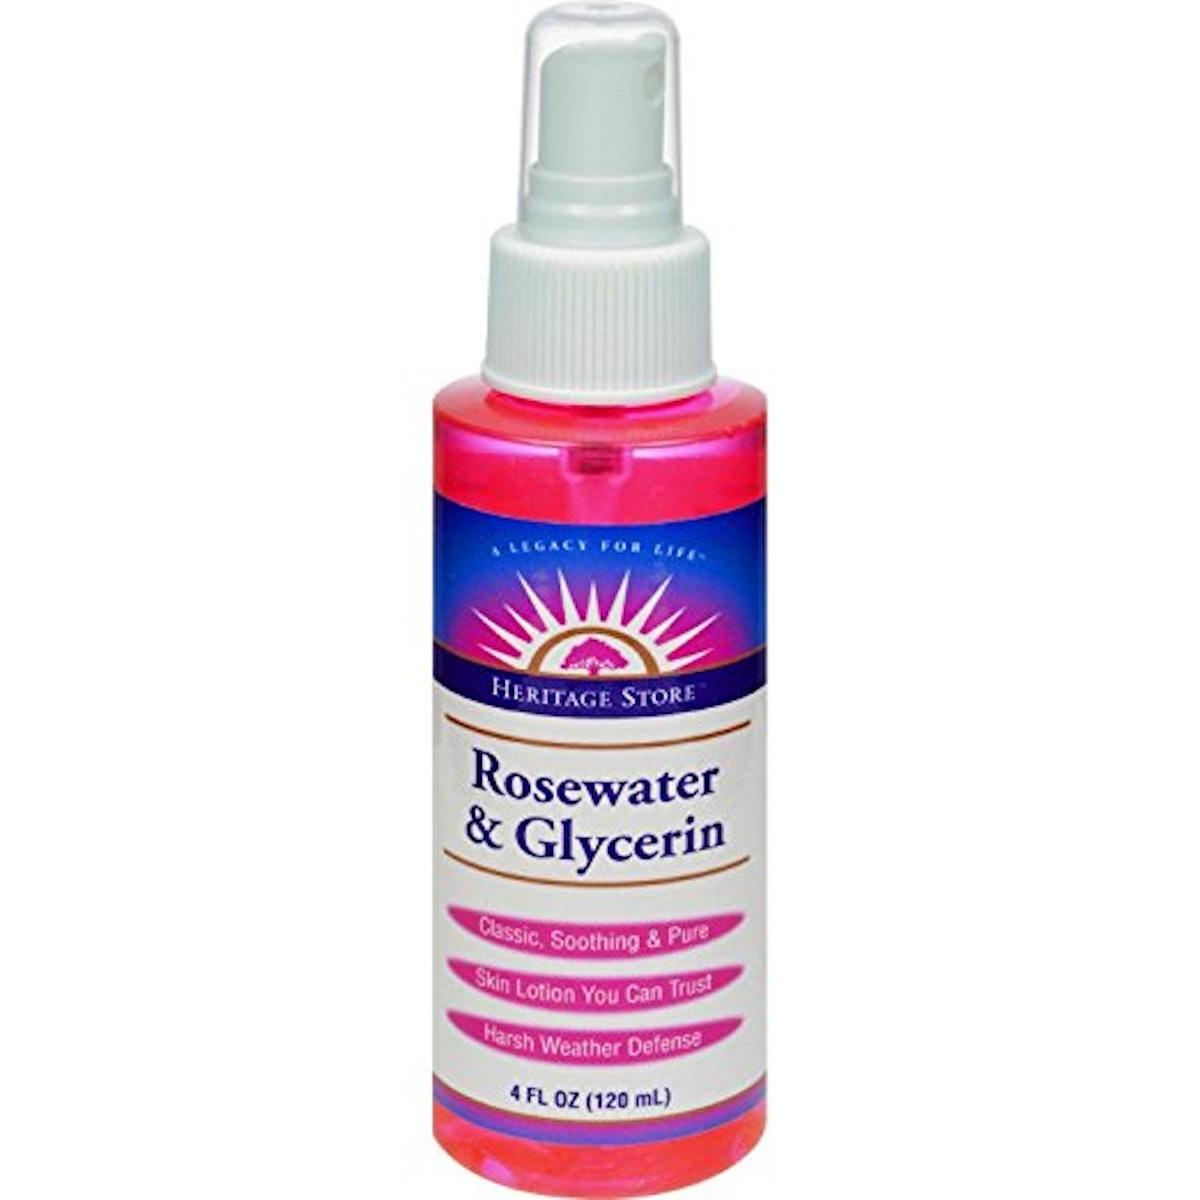 Heritage Rosewater & Glycerin